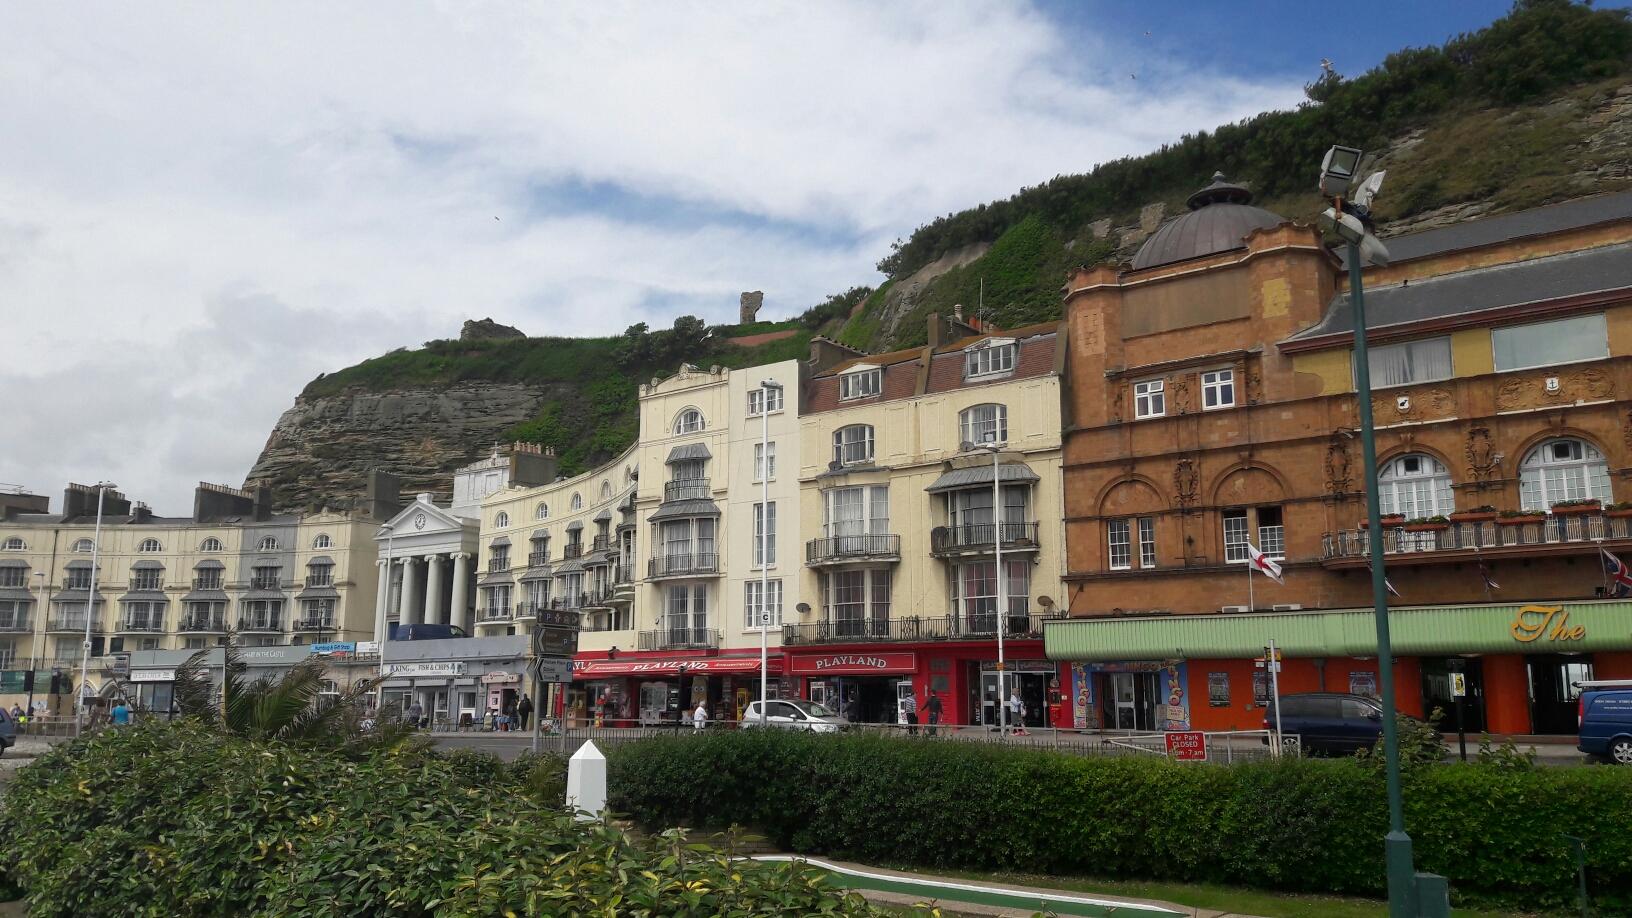 Promenade in Hastings, dei Häuser direkt am Fels gebaut